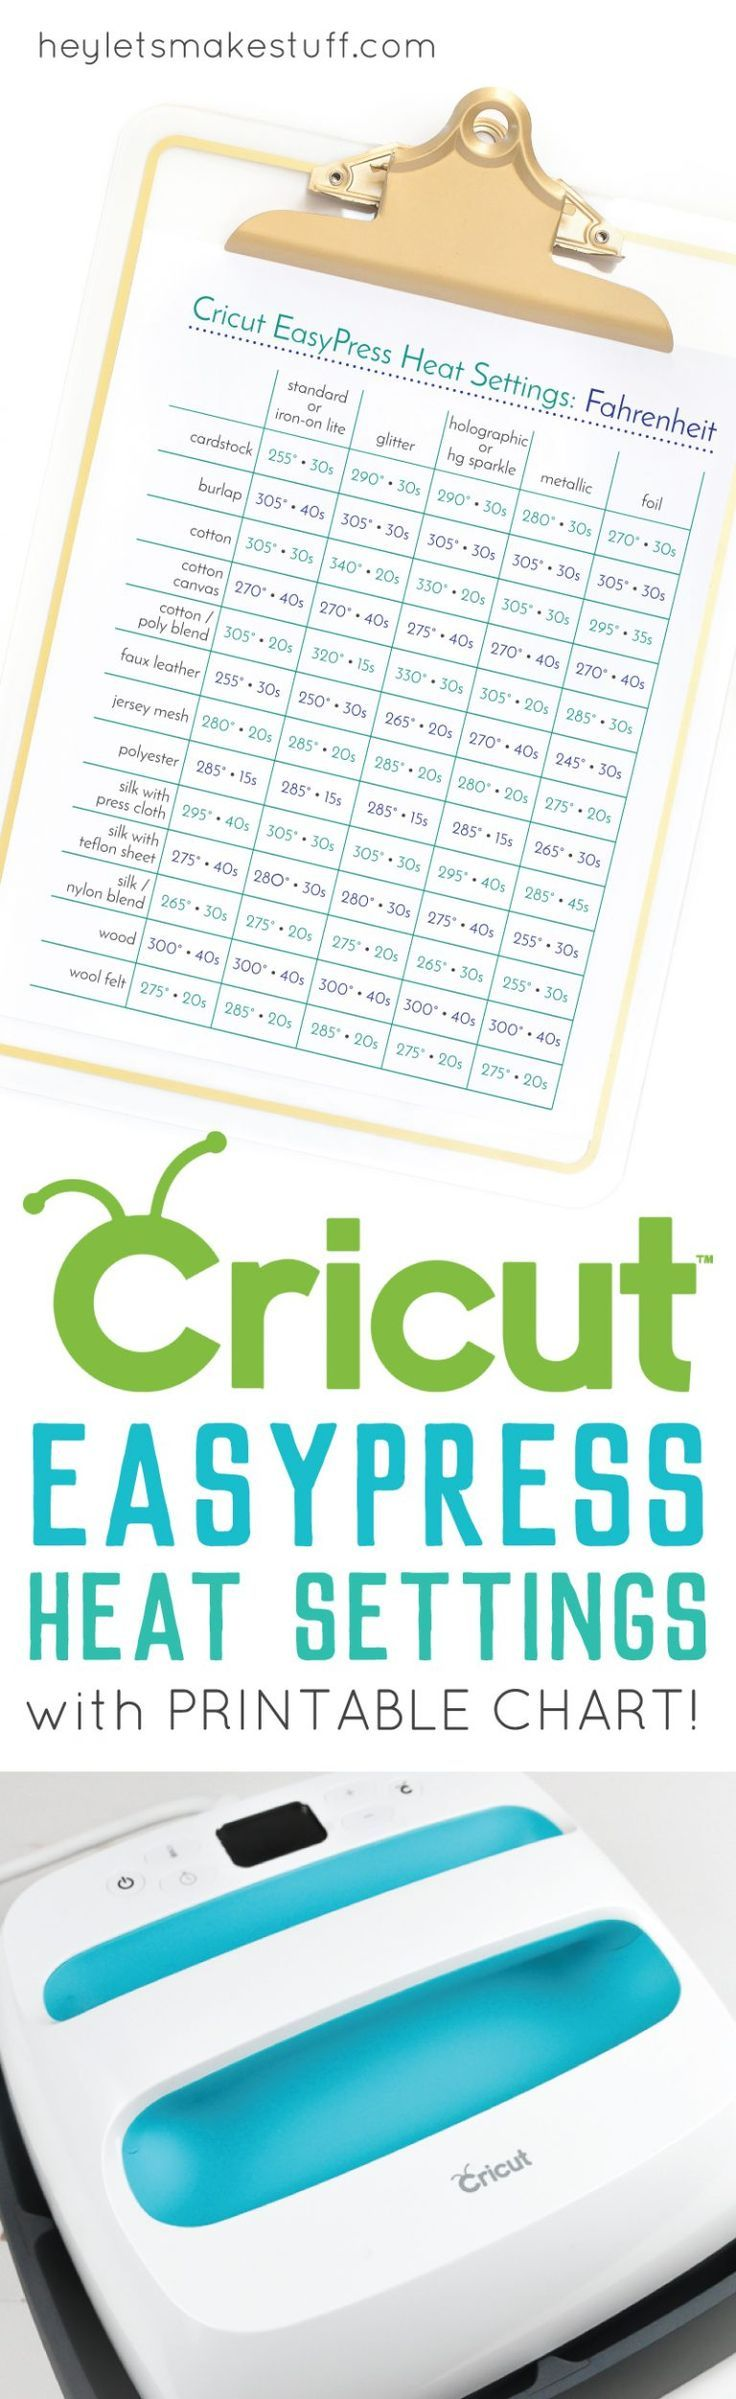 Heat Settings For The Cricut Easy Press Cricut Easy Press Cricut